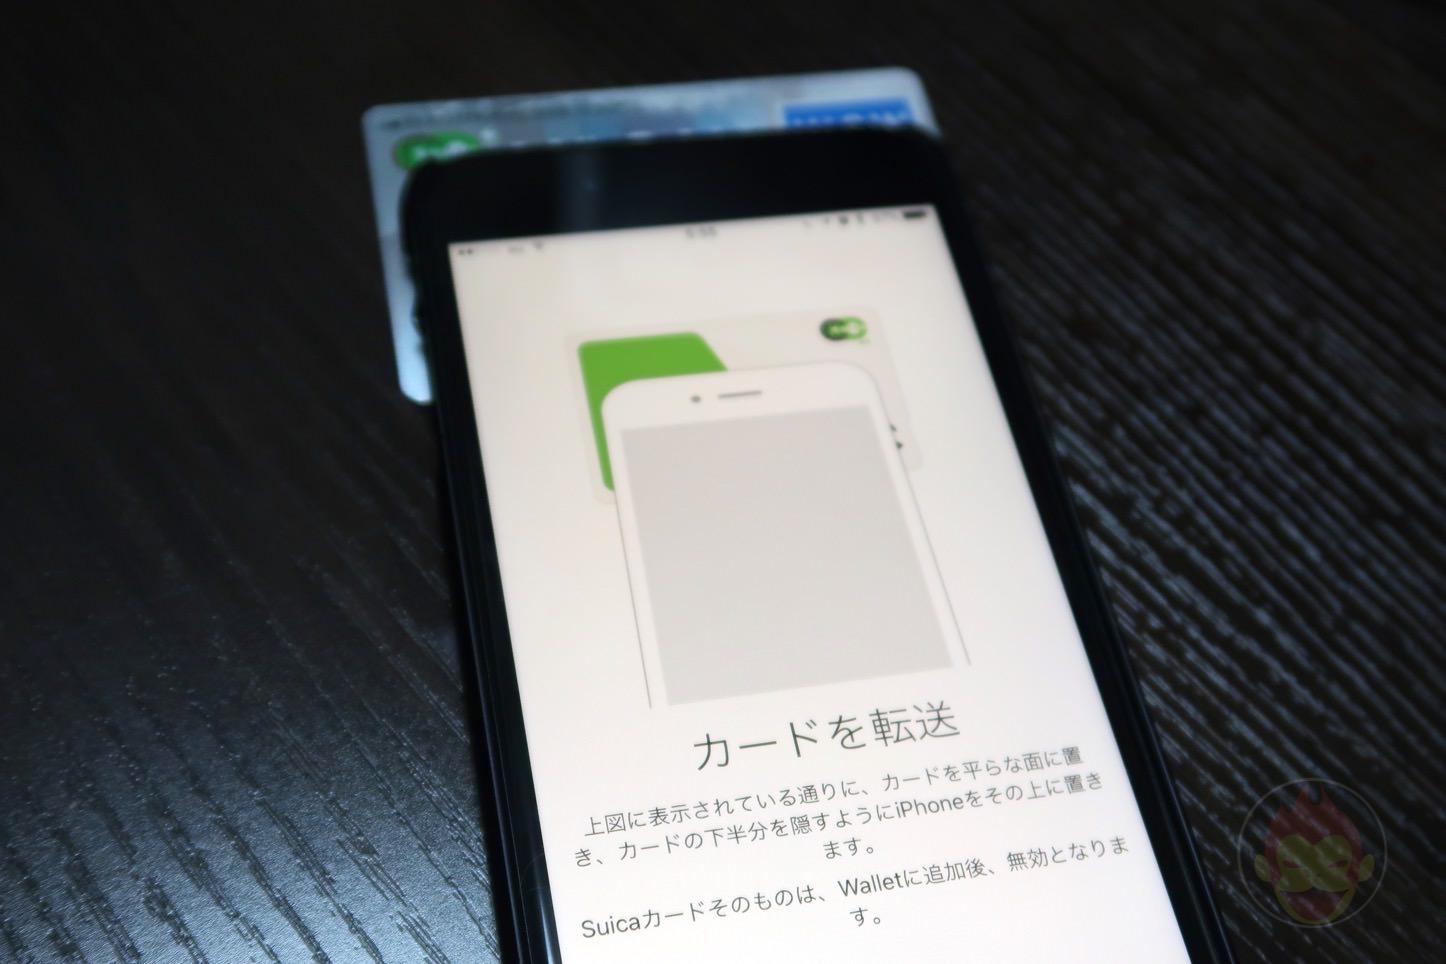 Adding-Suica-to-Wallet-App-01.JPG